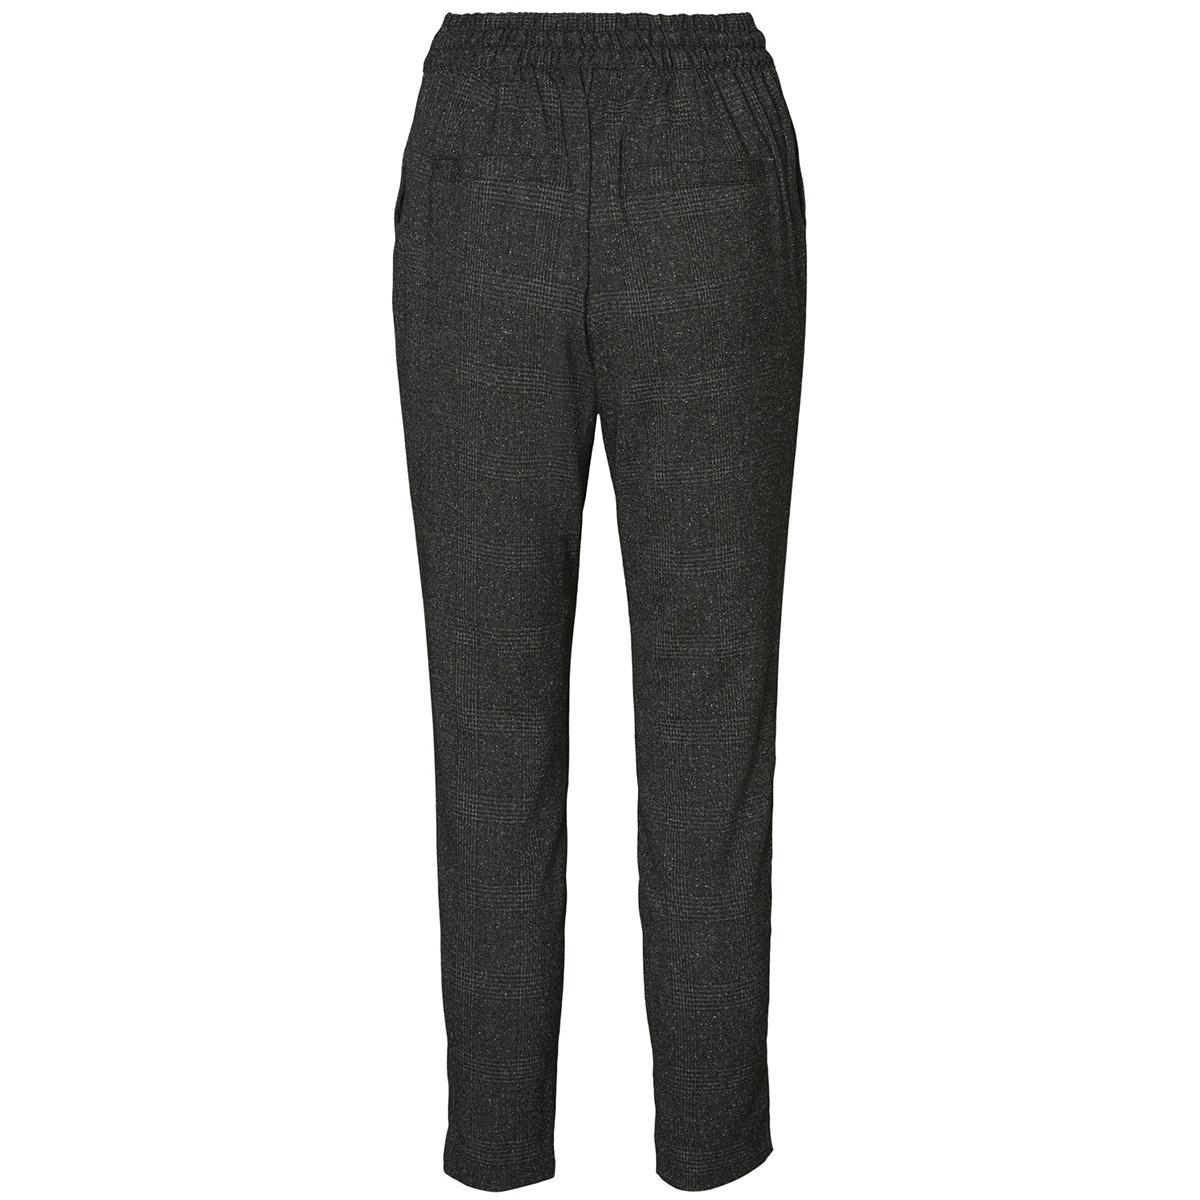 vmrory nw checked loose pant 10188532 vero moda broek dark grey/grey check